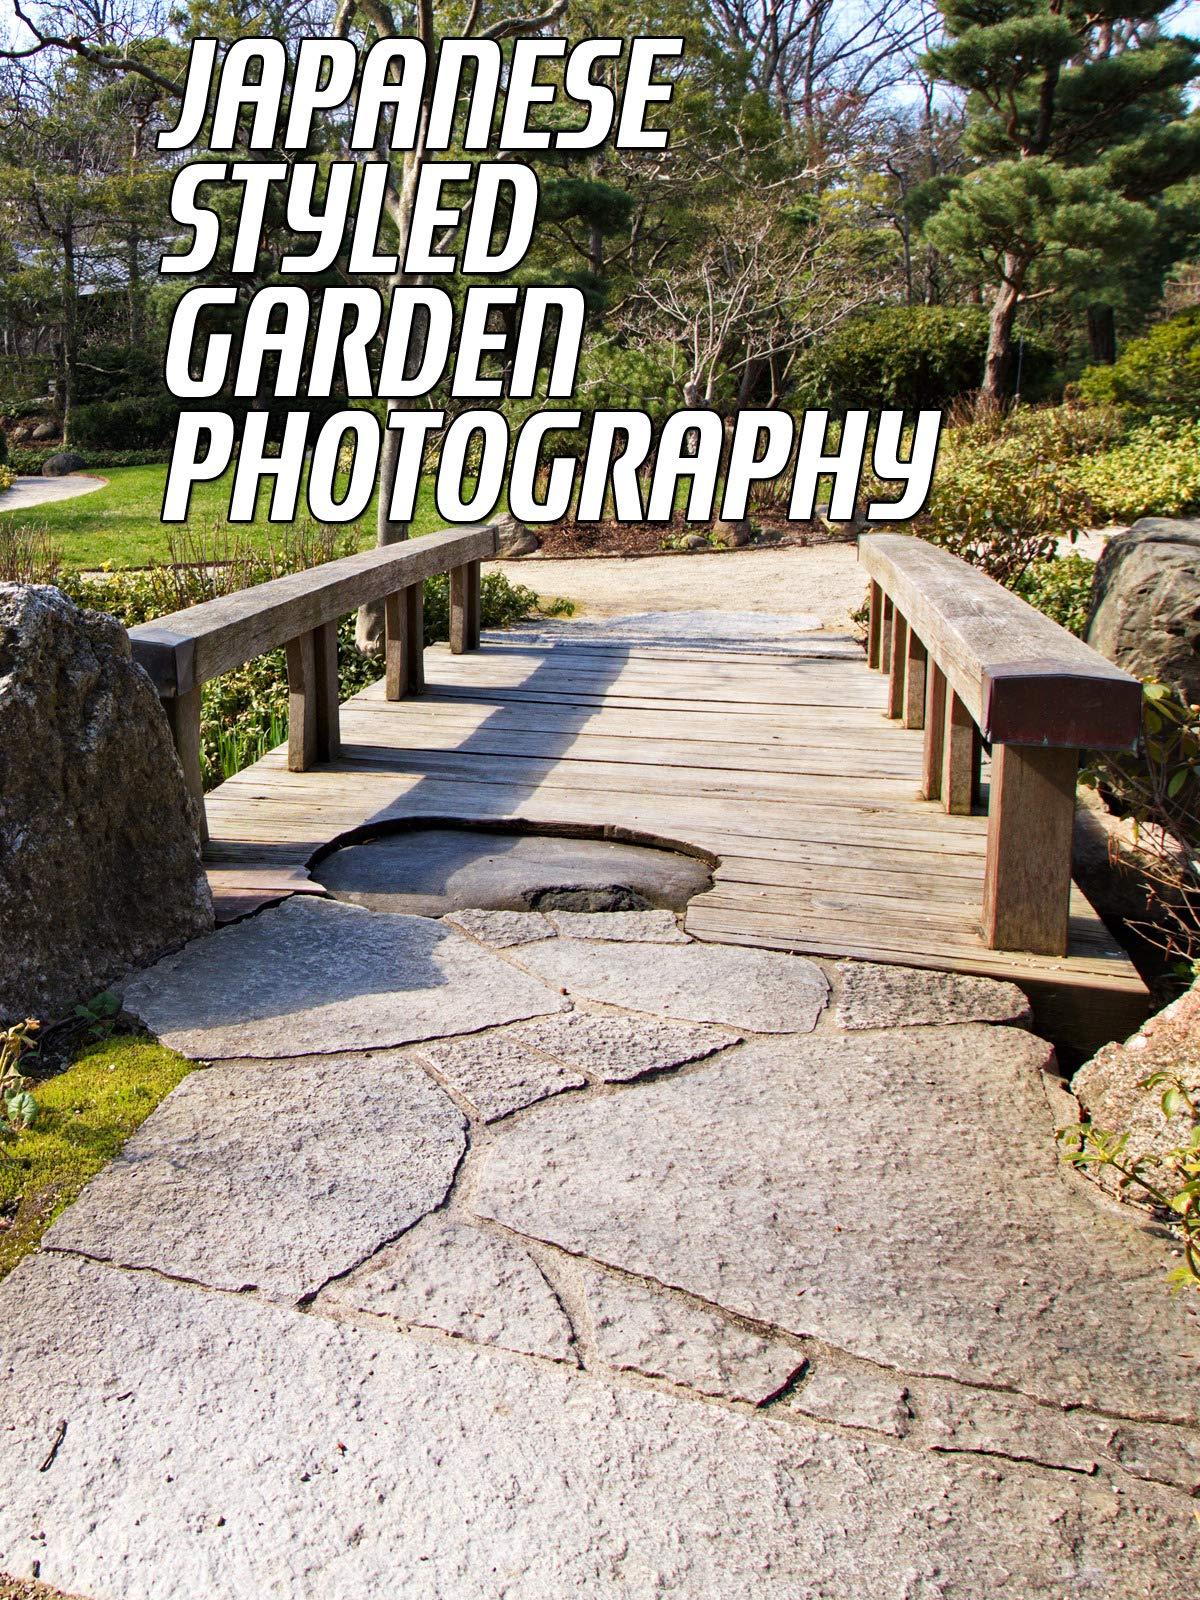 Japanese Styled Garden Photography